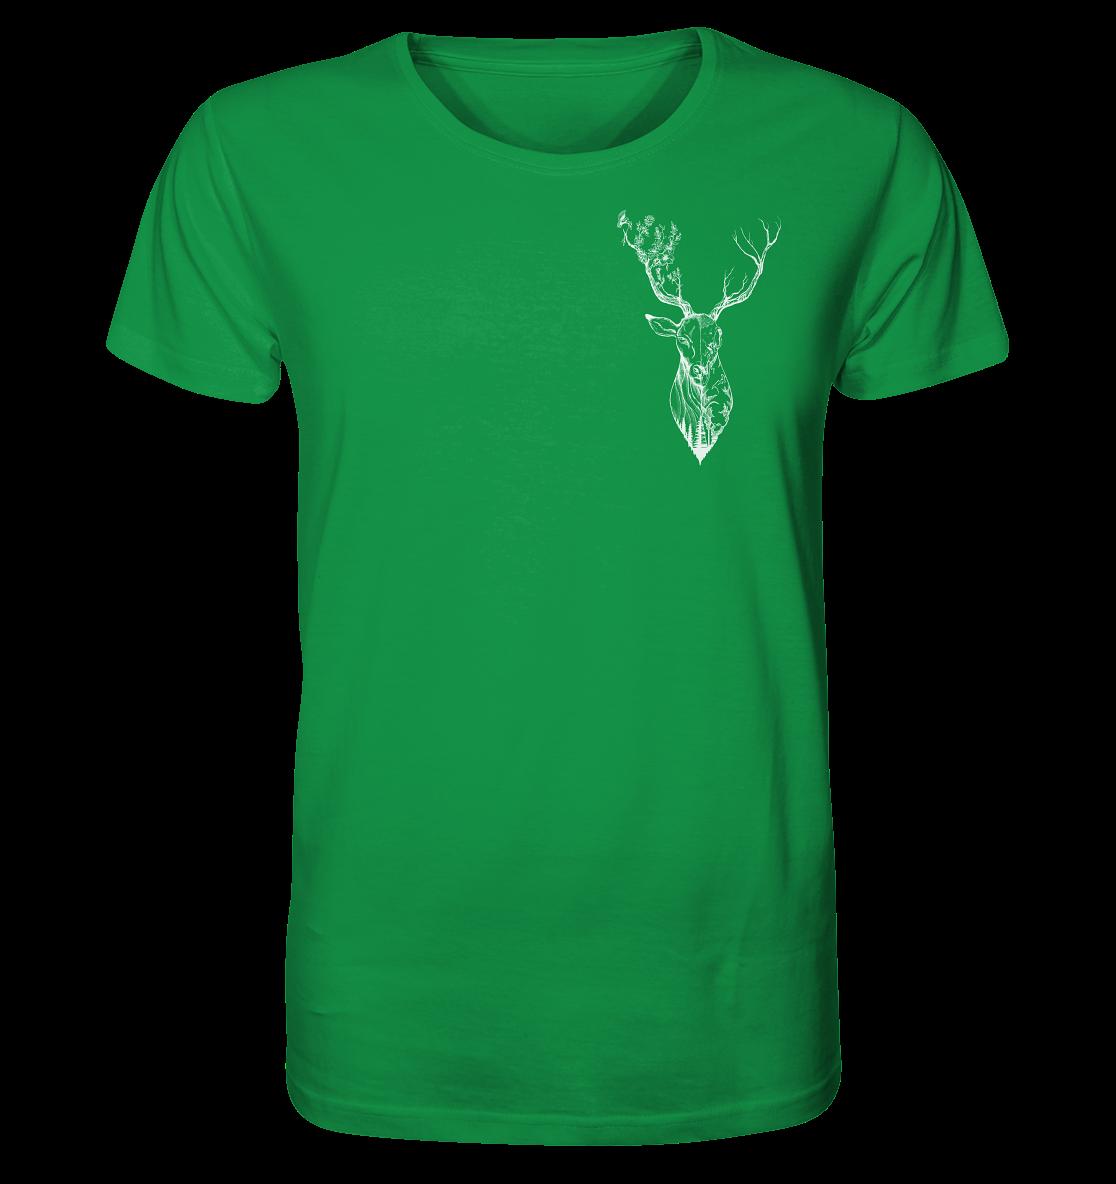 front-organic-shirt-149348-1116x-12.png